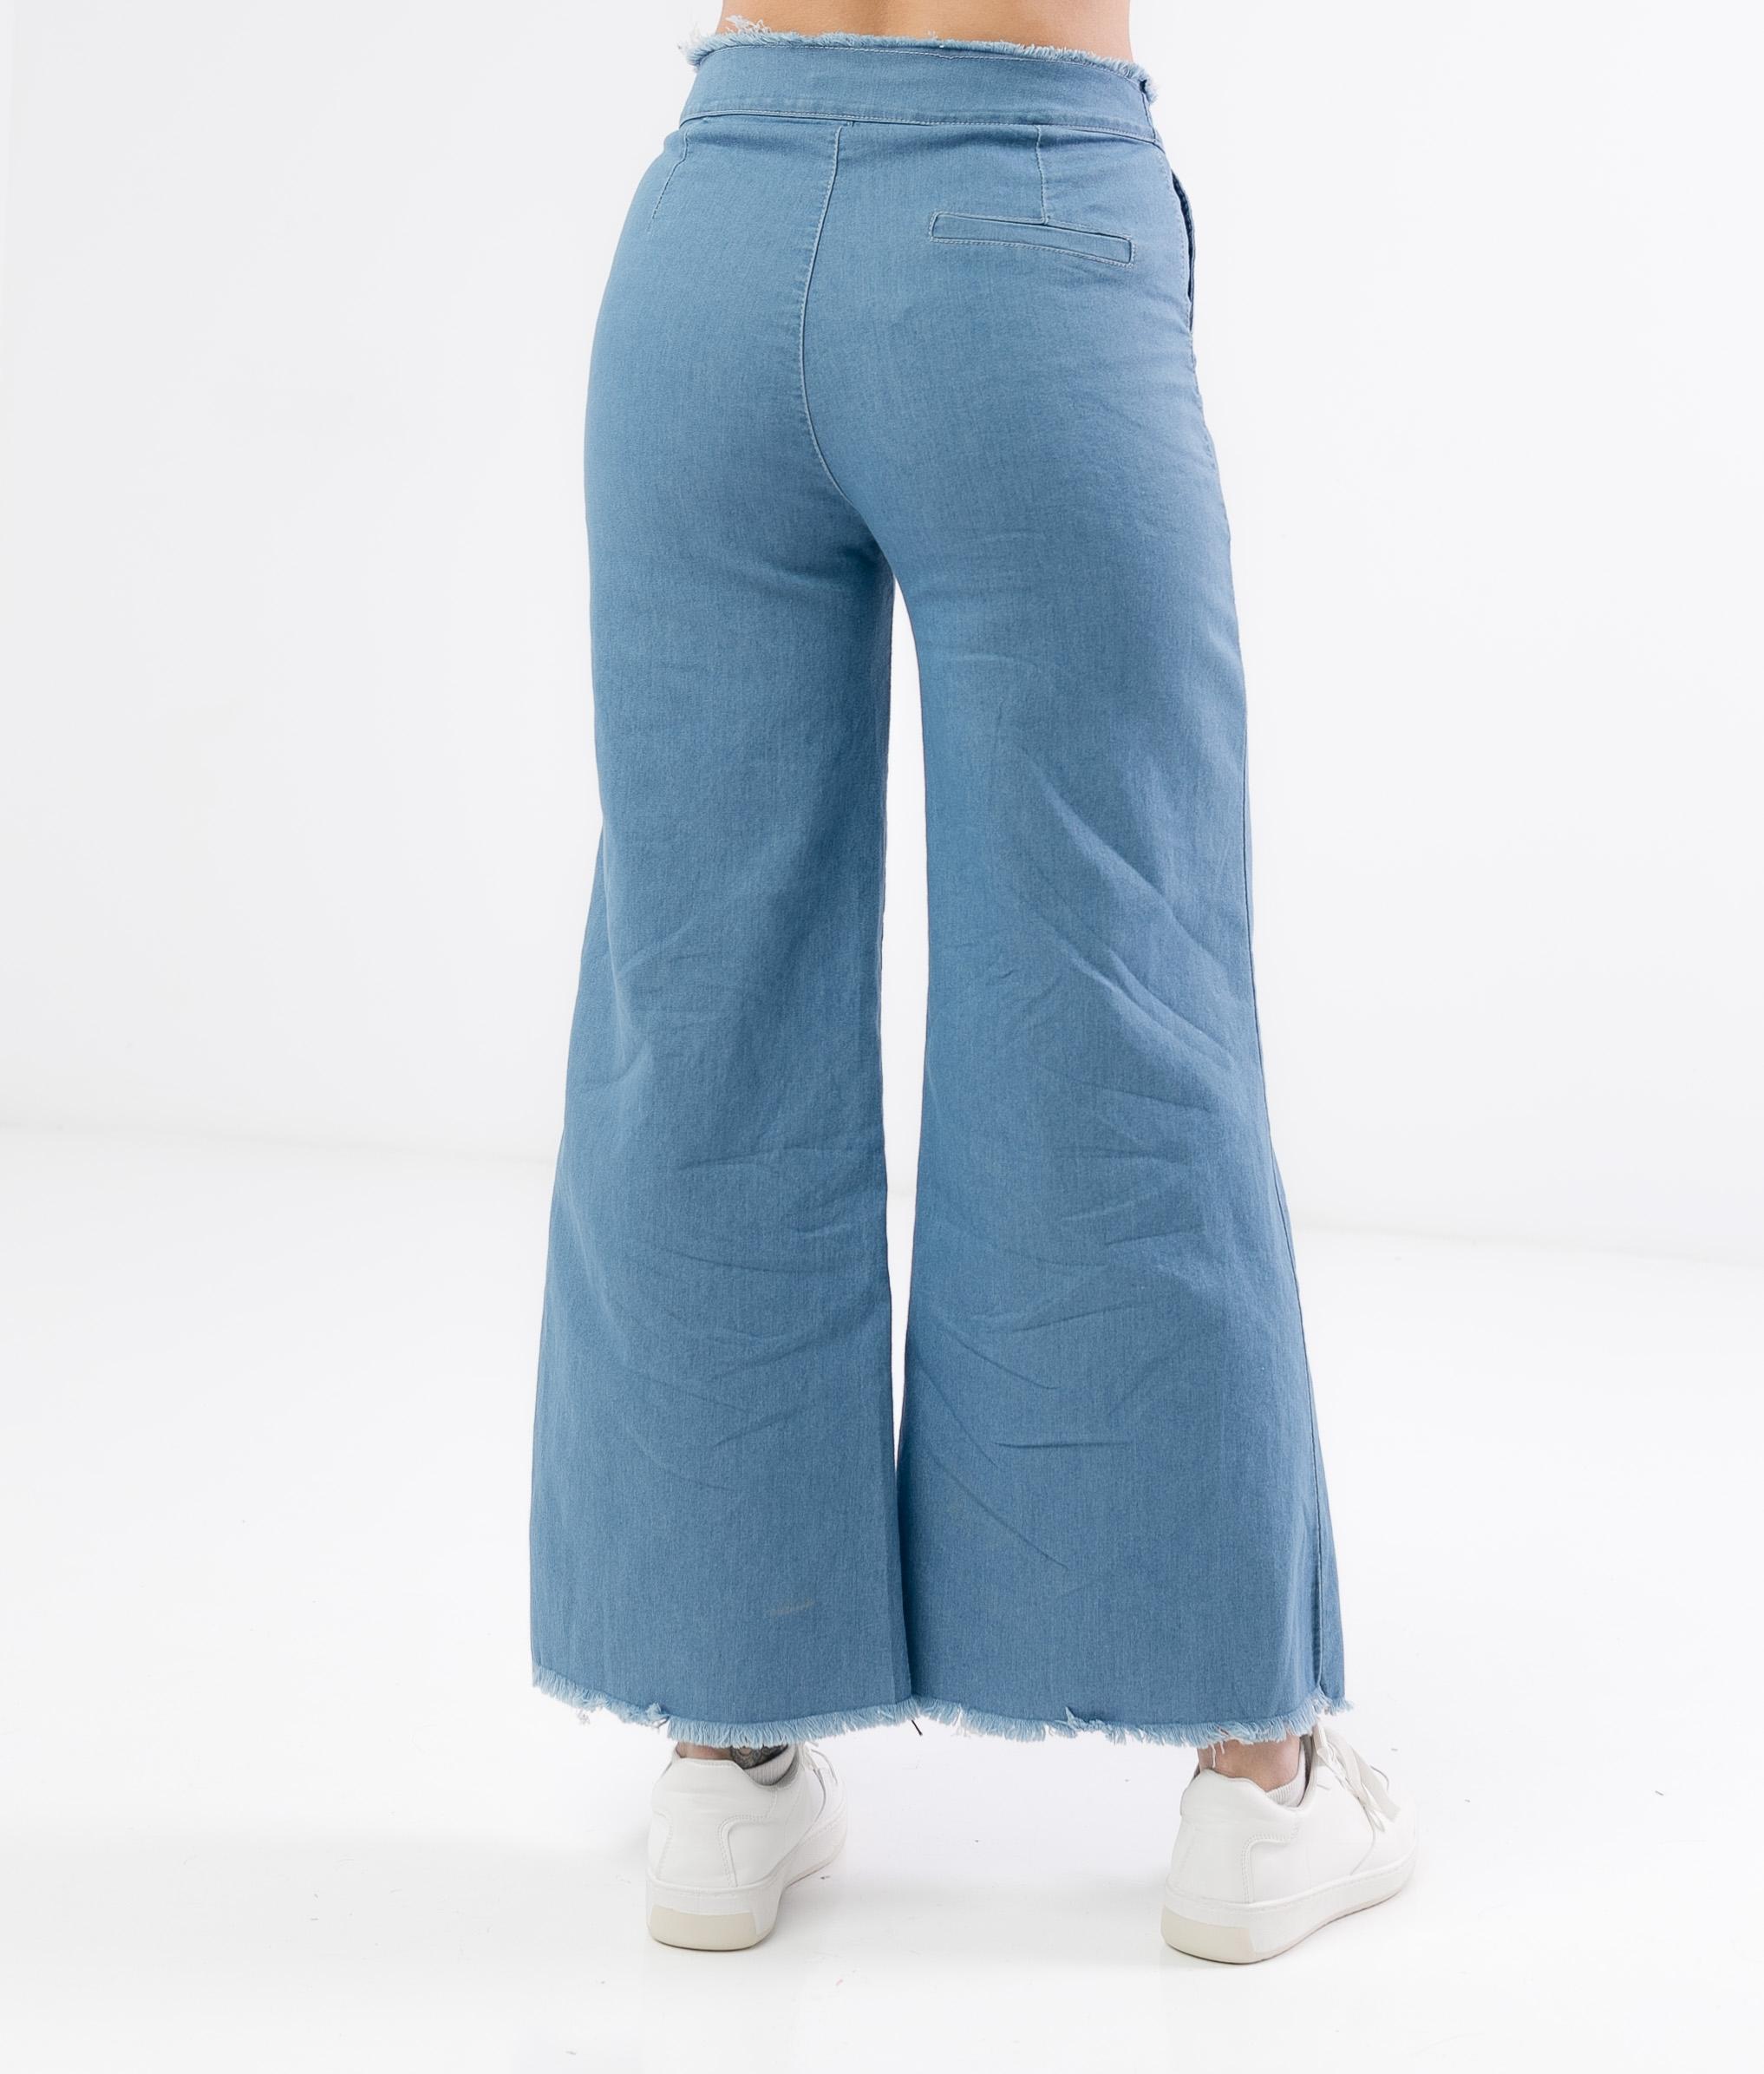 Pantalon Lumbus - Denim Claire